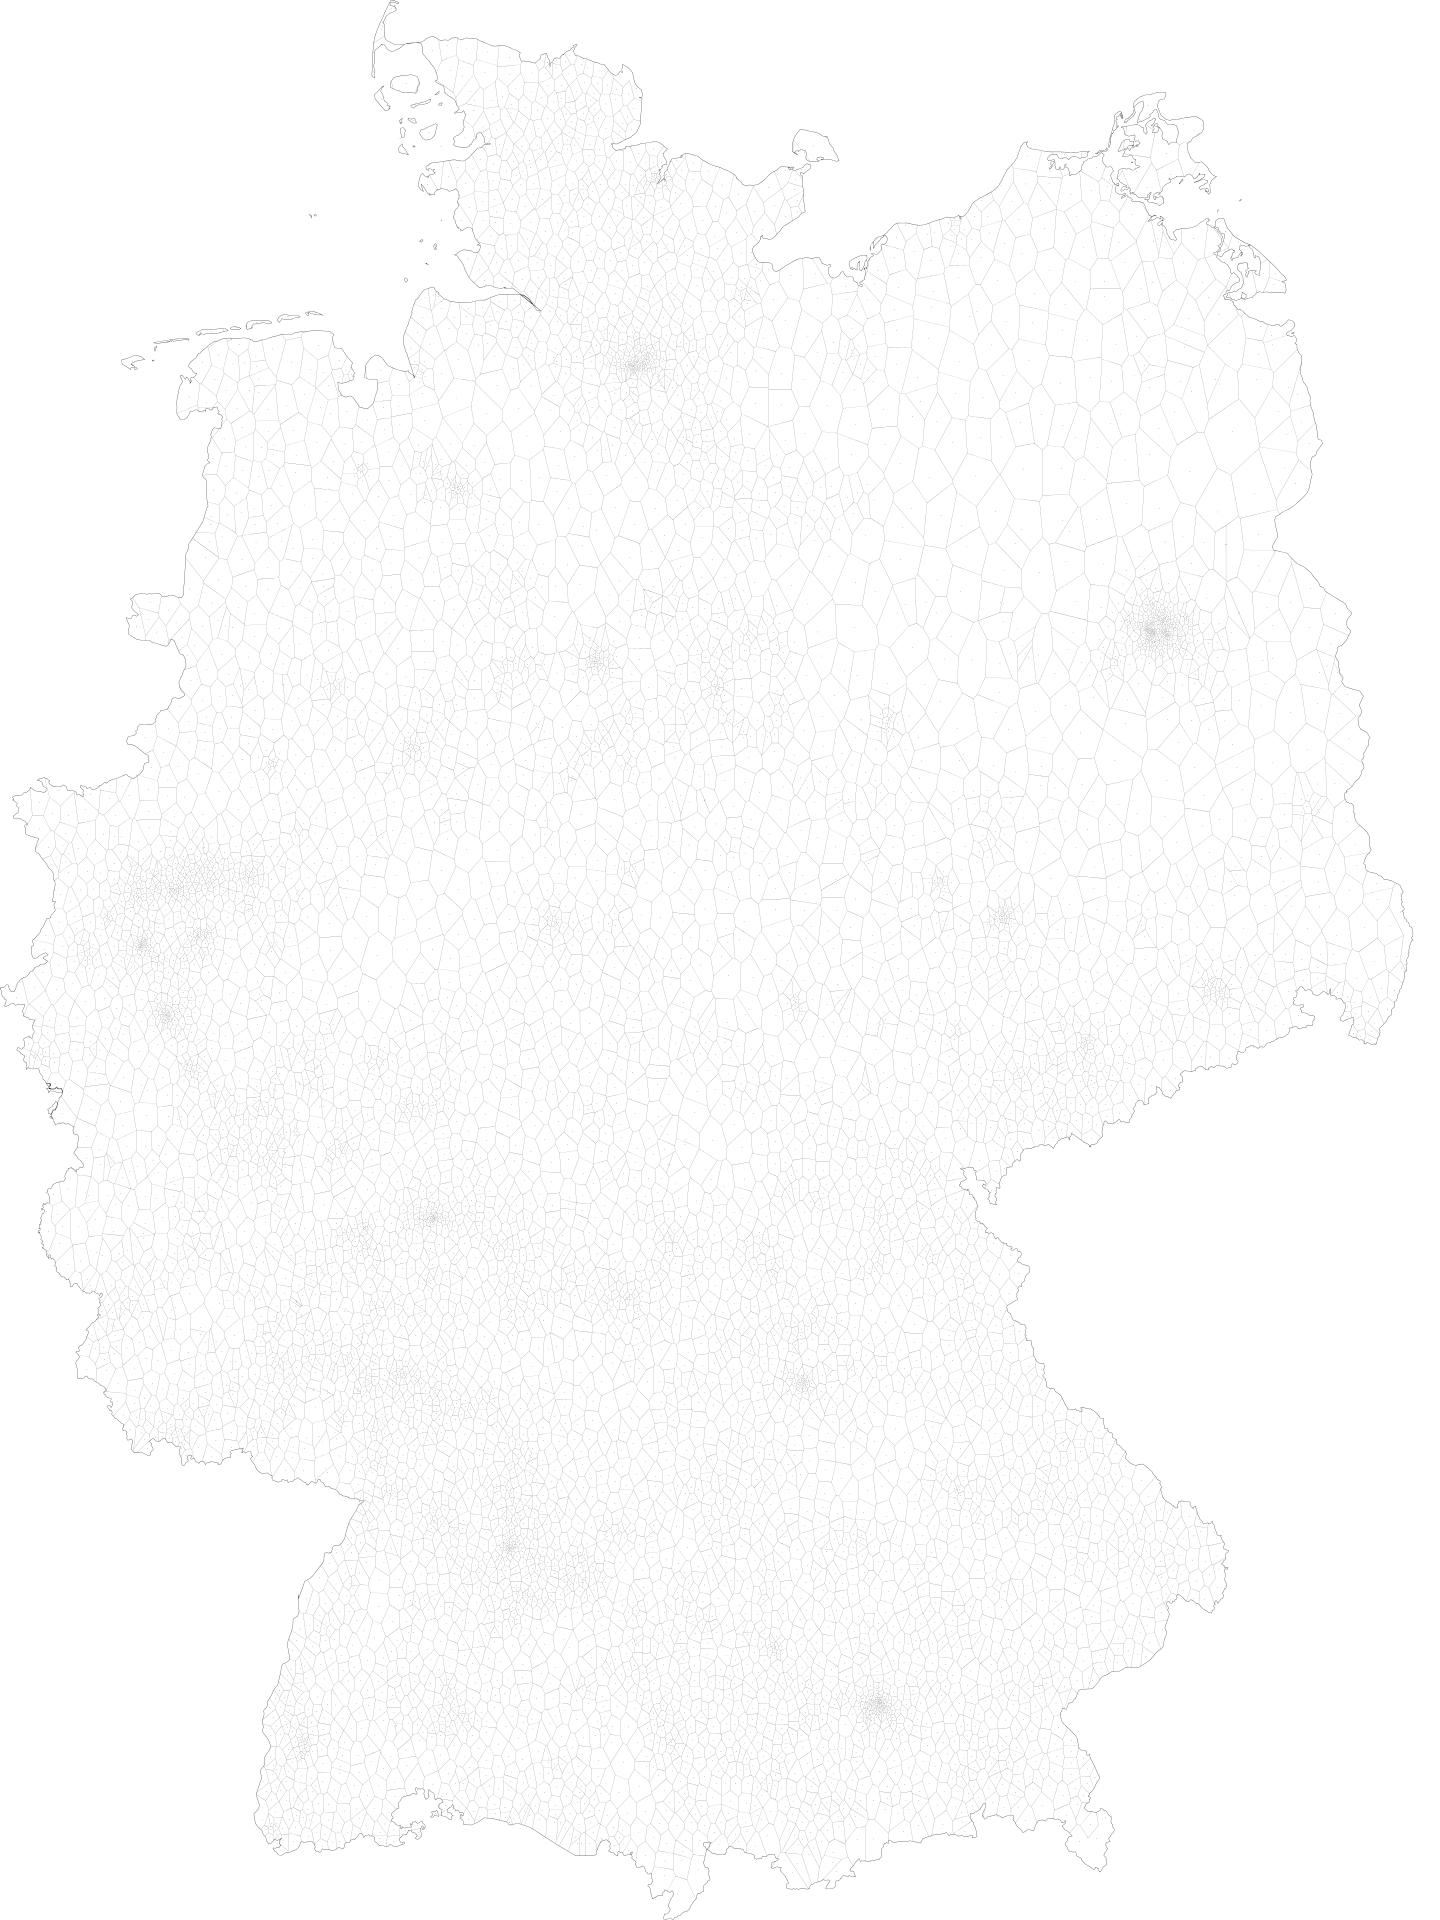 https://raw.github.com/mdornseif/pyGeoDb/master/maps/deutschland_gebiete.png